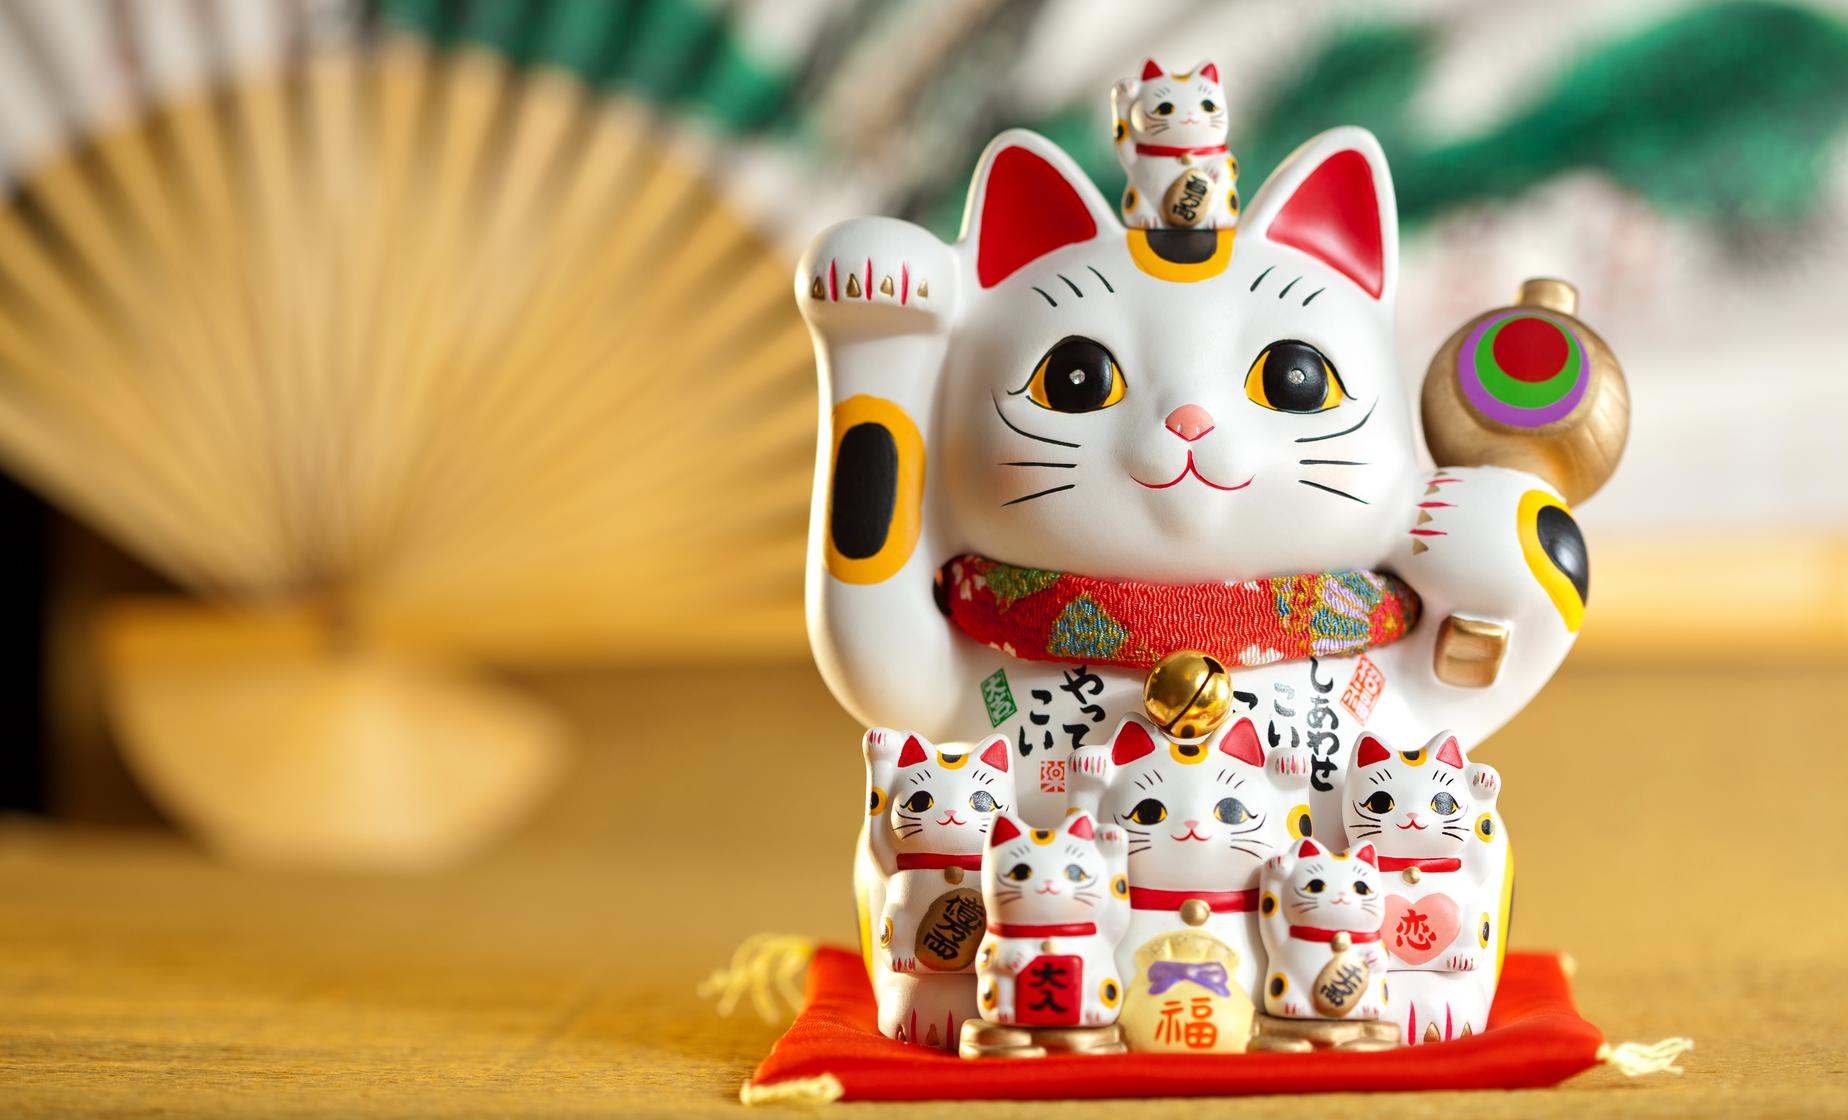 Japan's Cultural Curiosities